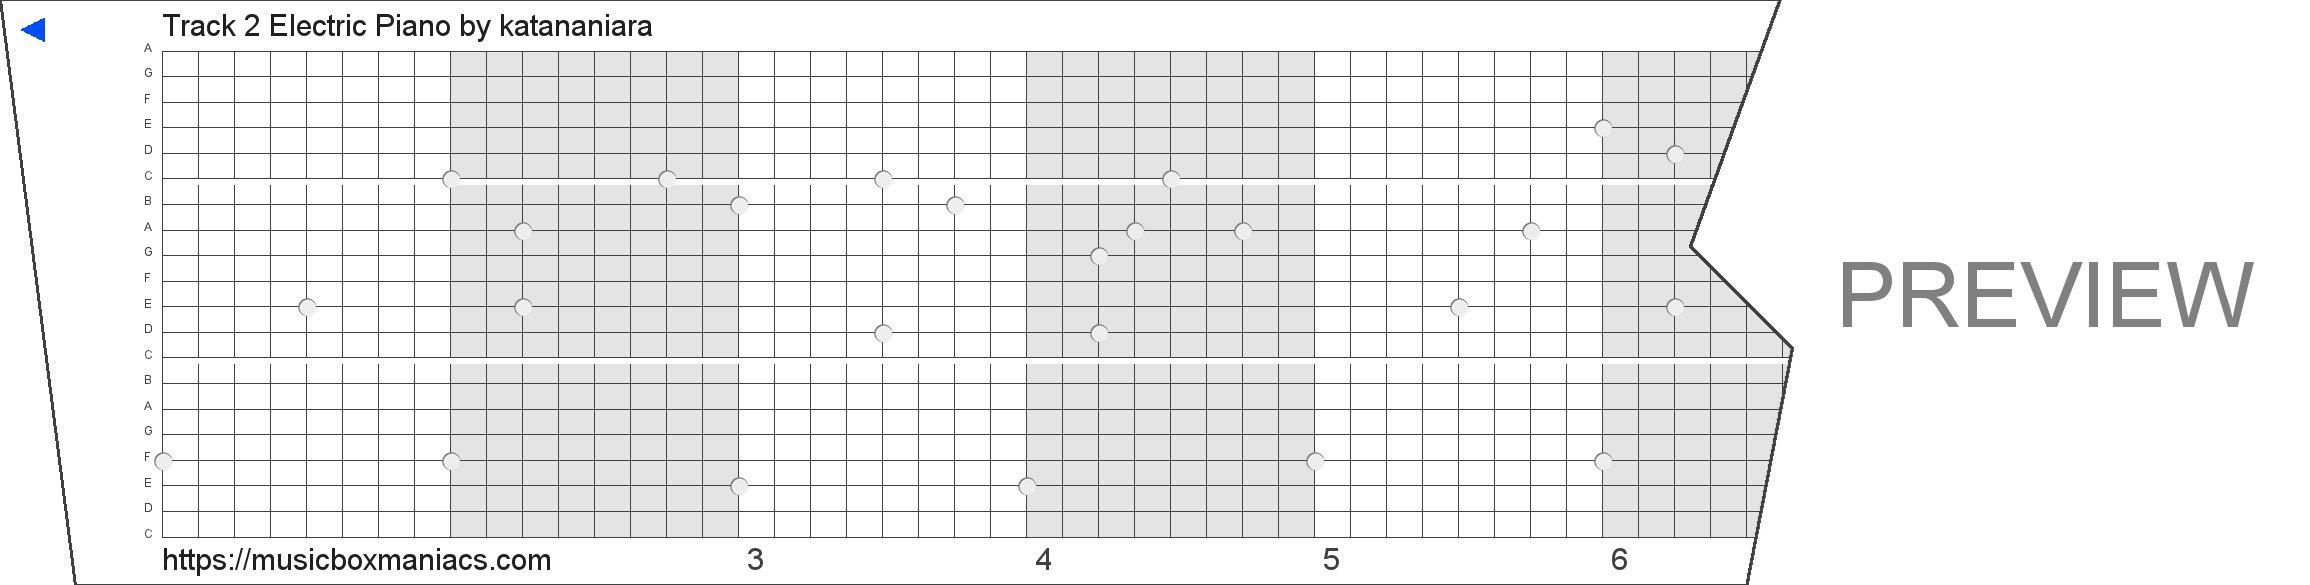 Track 2 Electric Piano 20 note music box paper strip